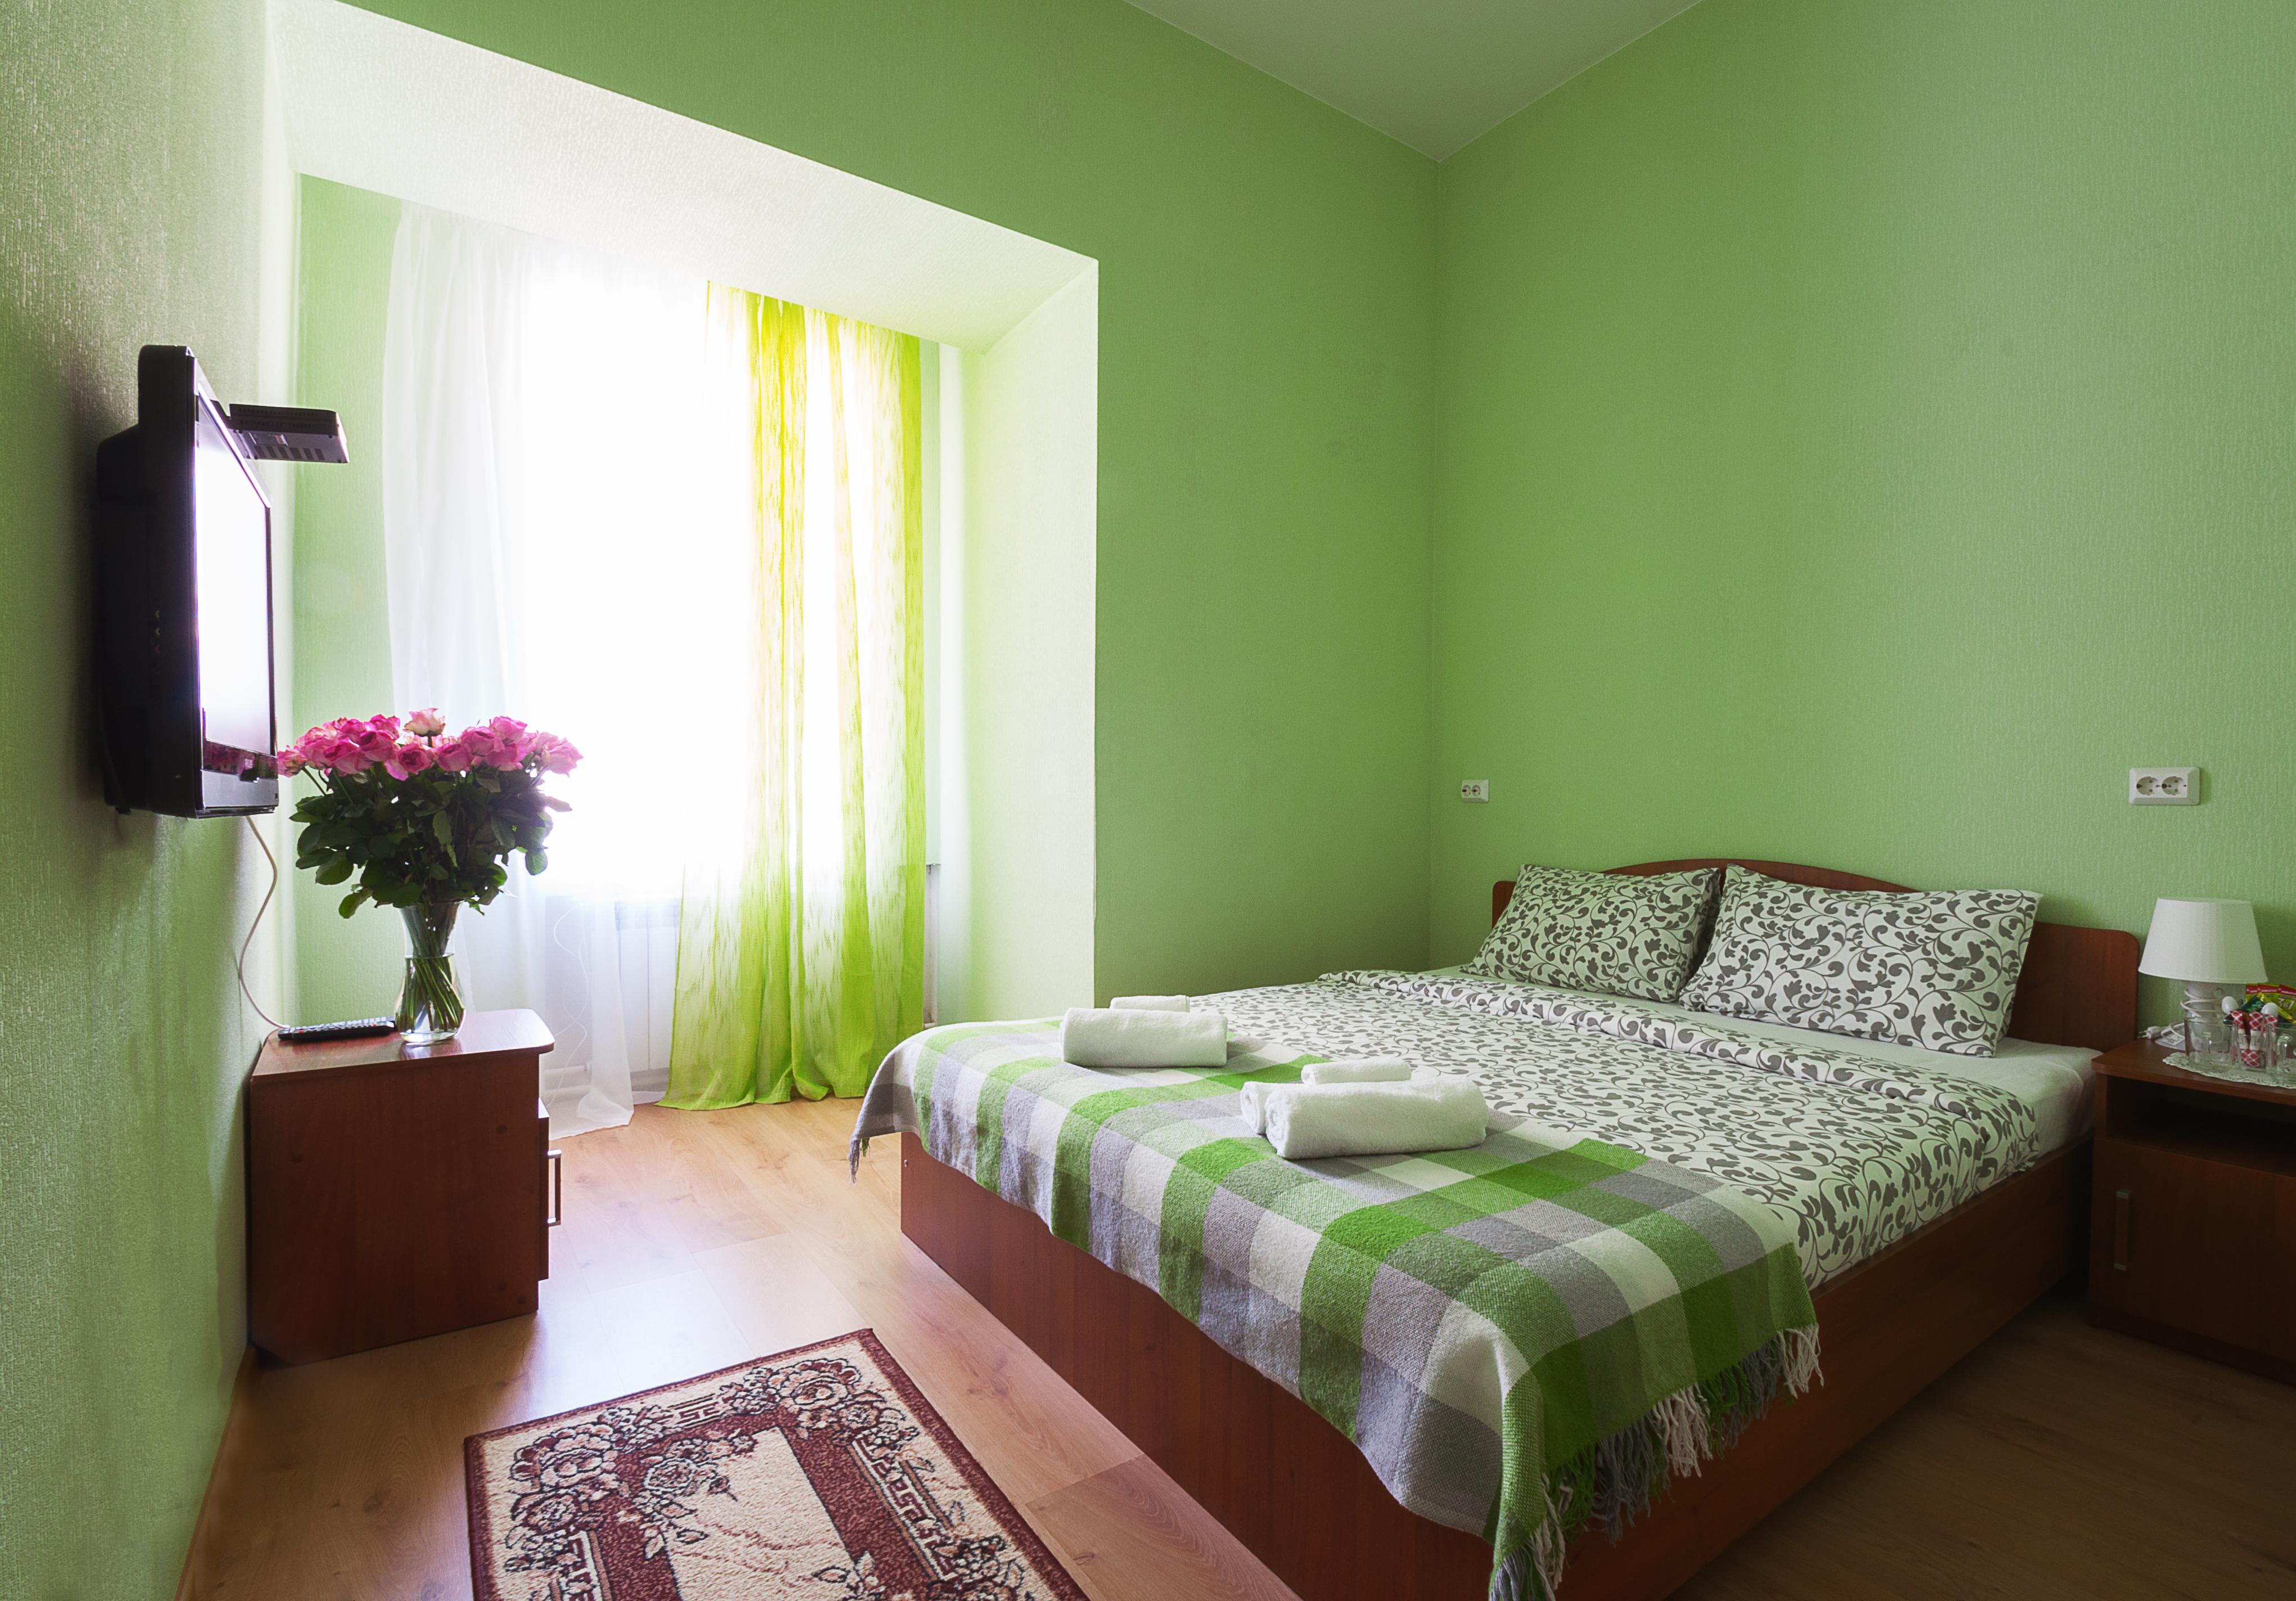 http://megapolis-hotel.ru/wp-content/uploads/2016/08/DSC_5513.jpg